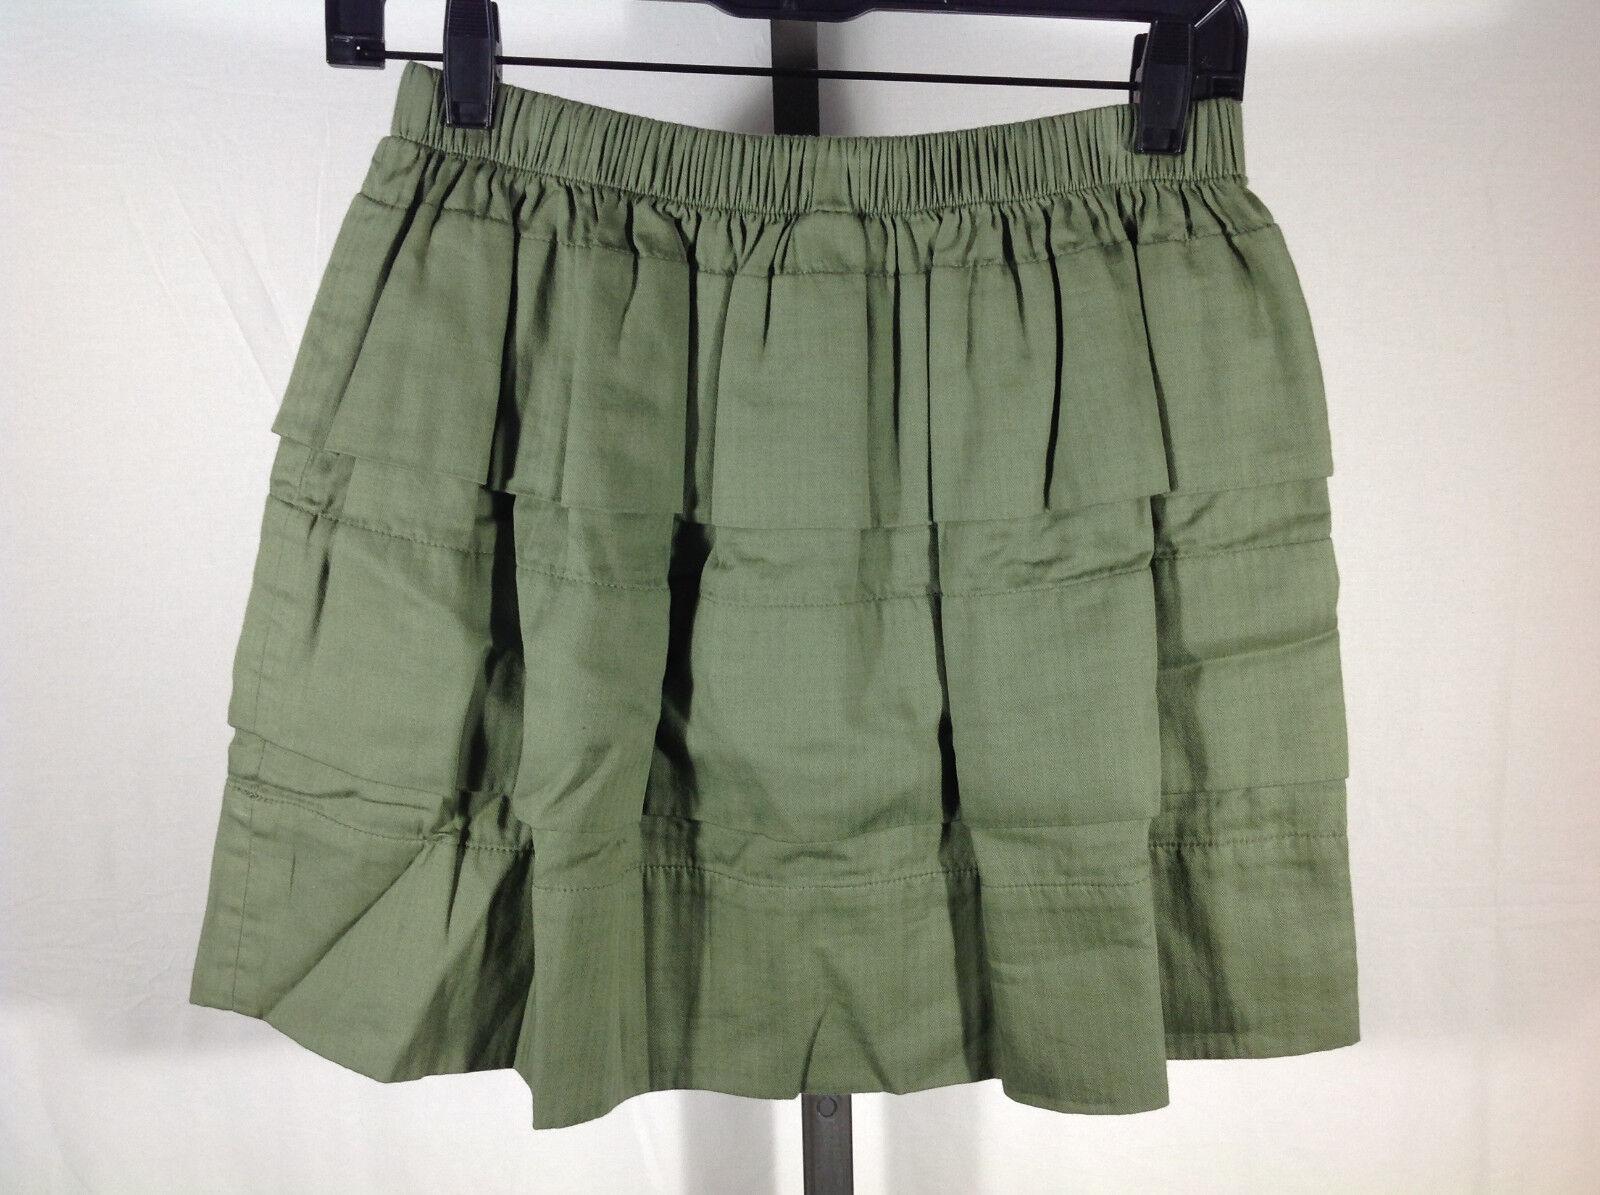 Ruffled Tiered Skirt M Medium Army Green